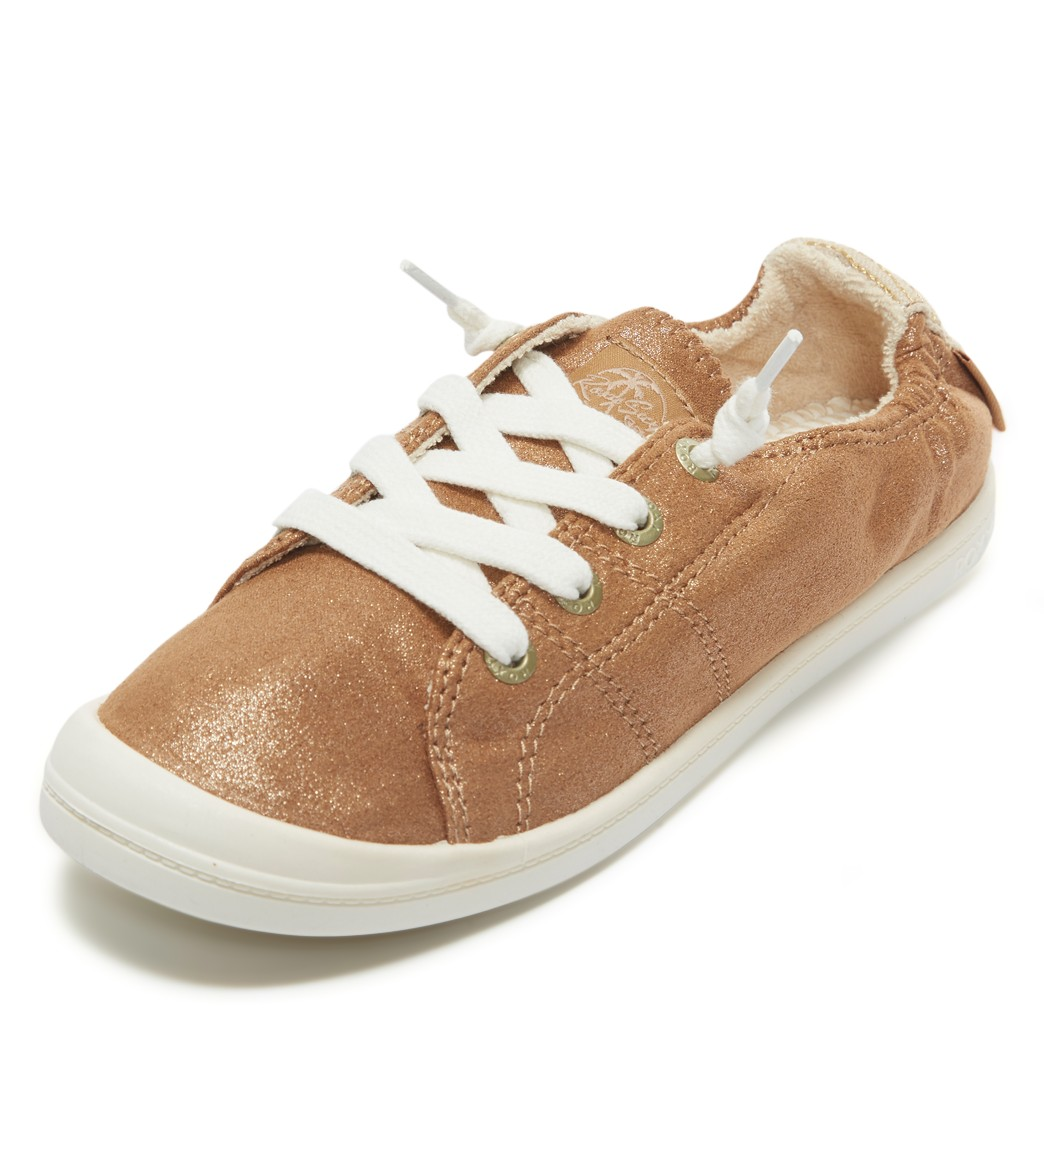 Roxy Women's Bayshore III Shoe at